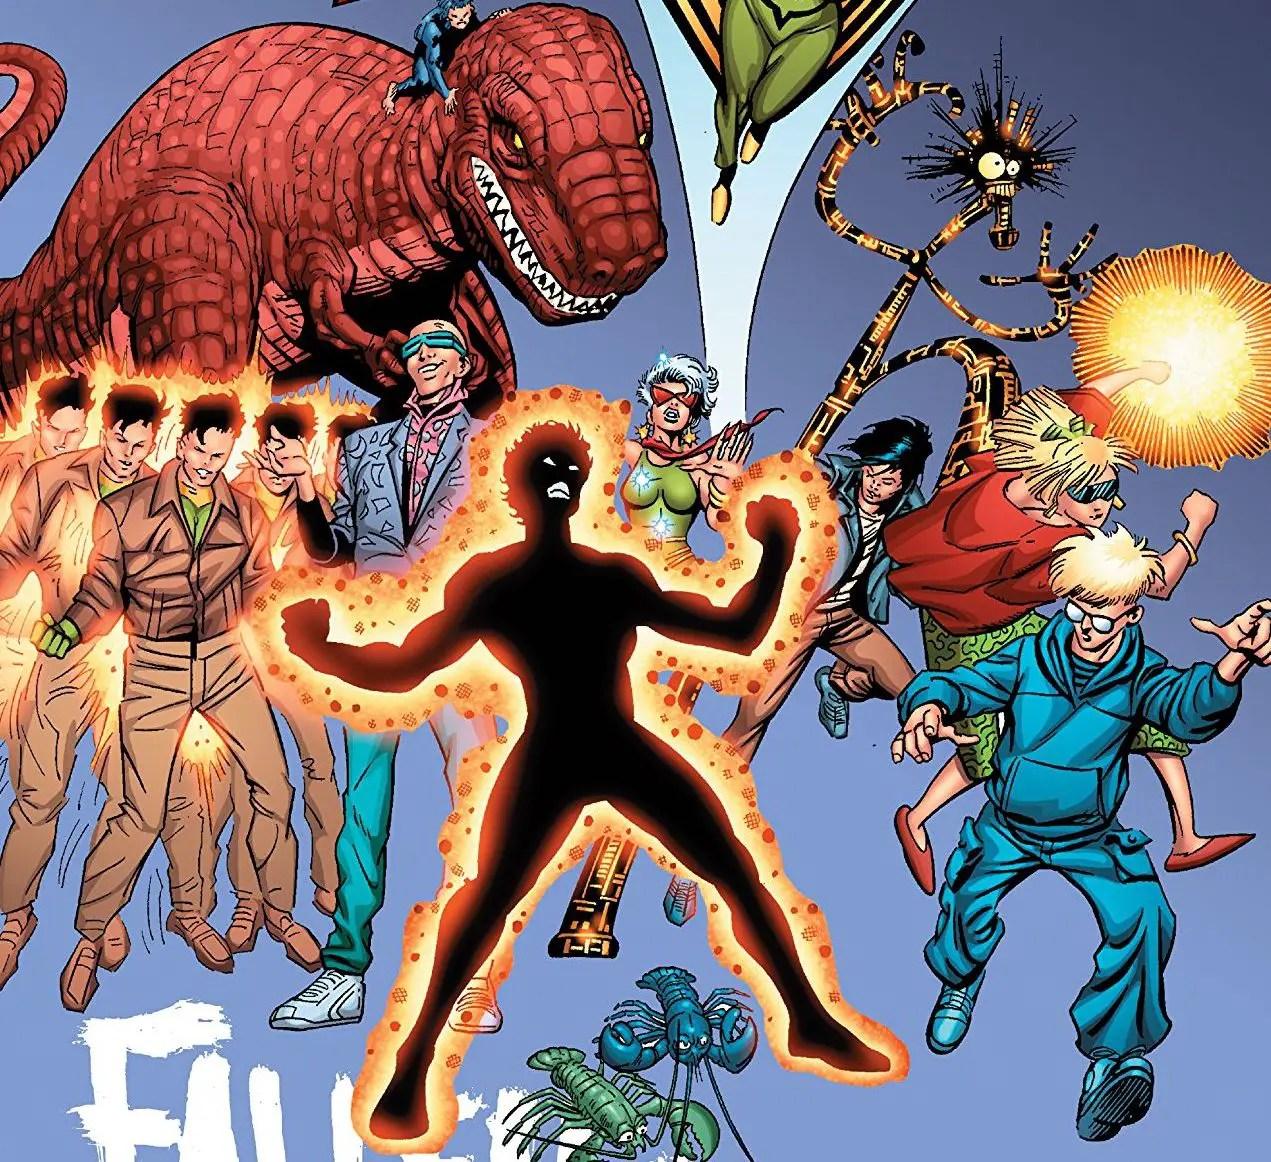 'X-Men: Fallen Angels' TPB review: an overlooked highlight of the New Mutants